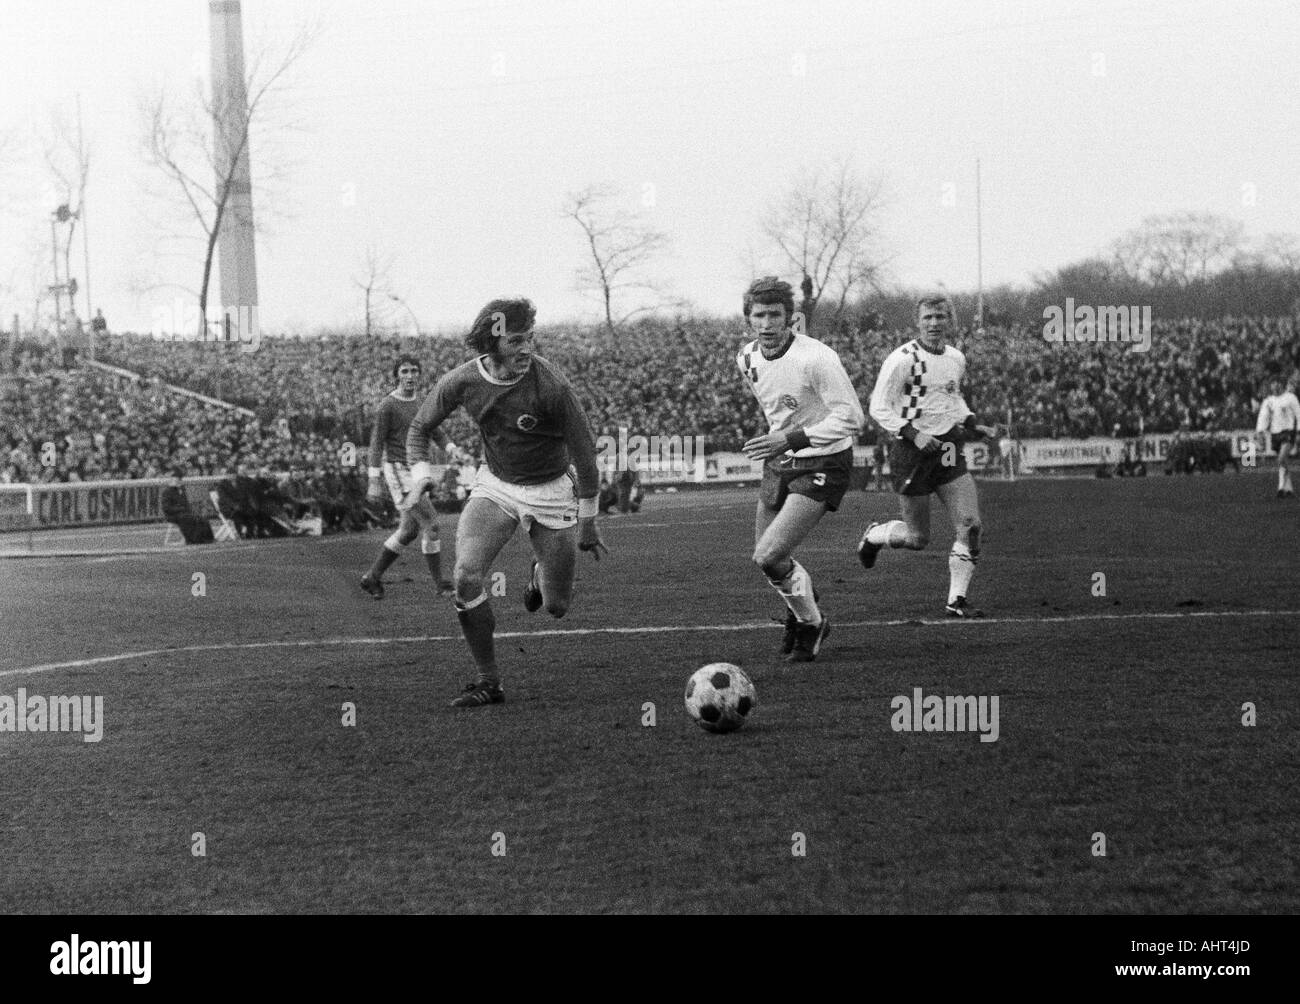 football, Bundesliga, 1970/1971, Niederrhein Stadium, Rot-Weiss Oberhausen versus Rot-Weiss Essen 0:0, scene of the match, f.l.t.r. Guenter Karbowiak, Wolfgang Suehnholz (both RWO), Hermann Erlhoff, Heinz Stauvermann (both RWE) - Stock Image